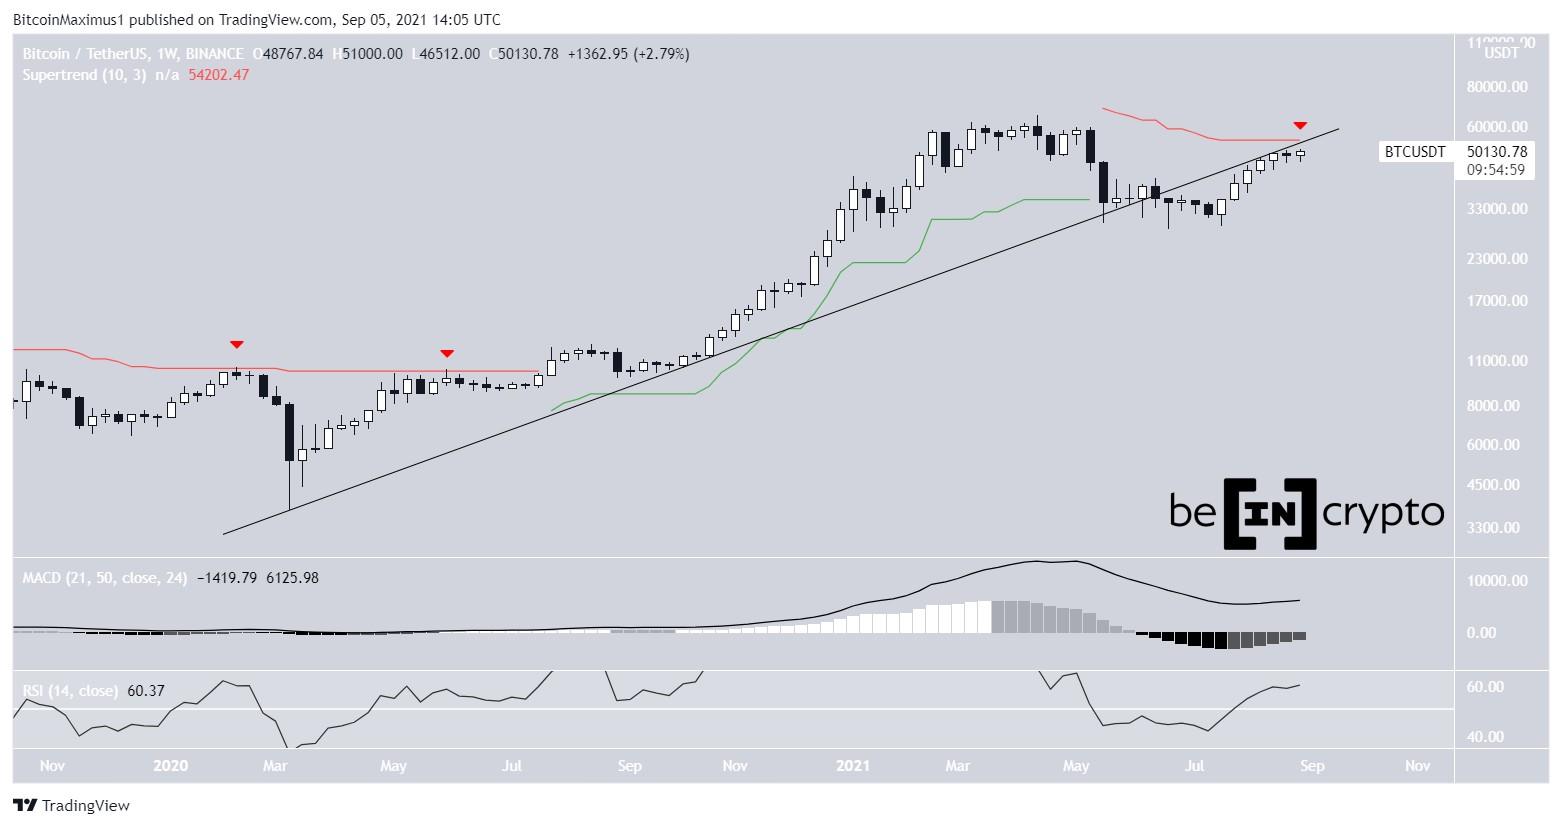 BTC long-term movement